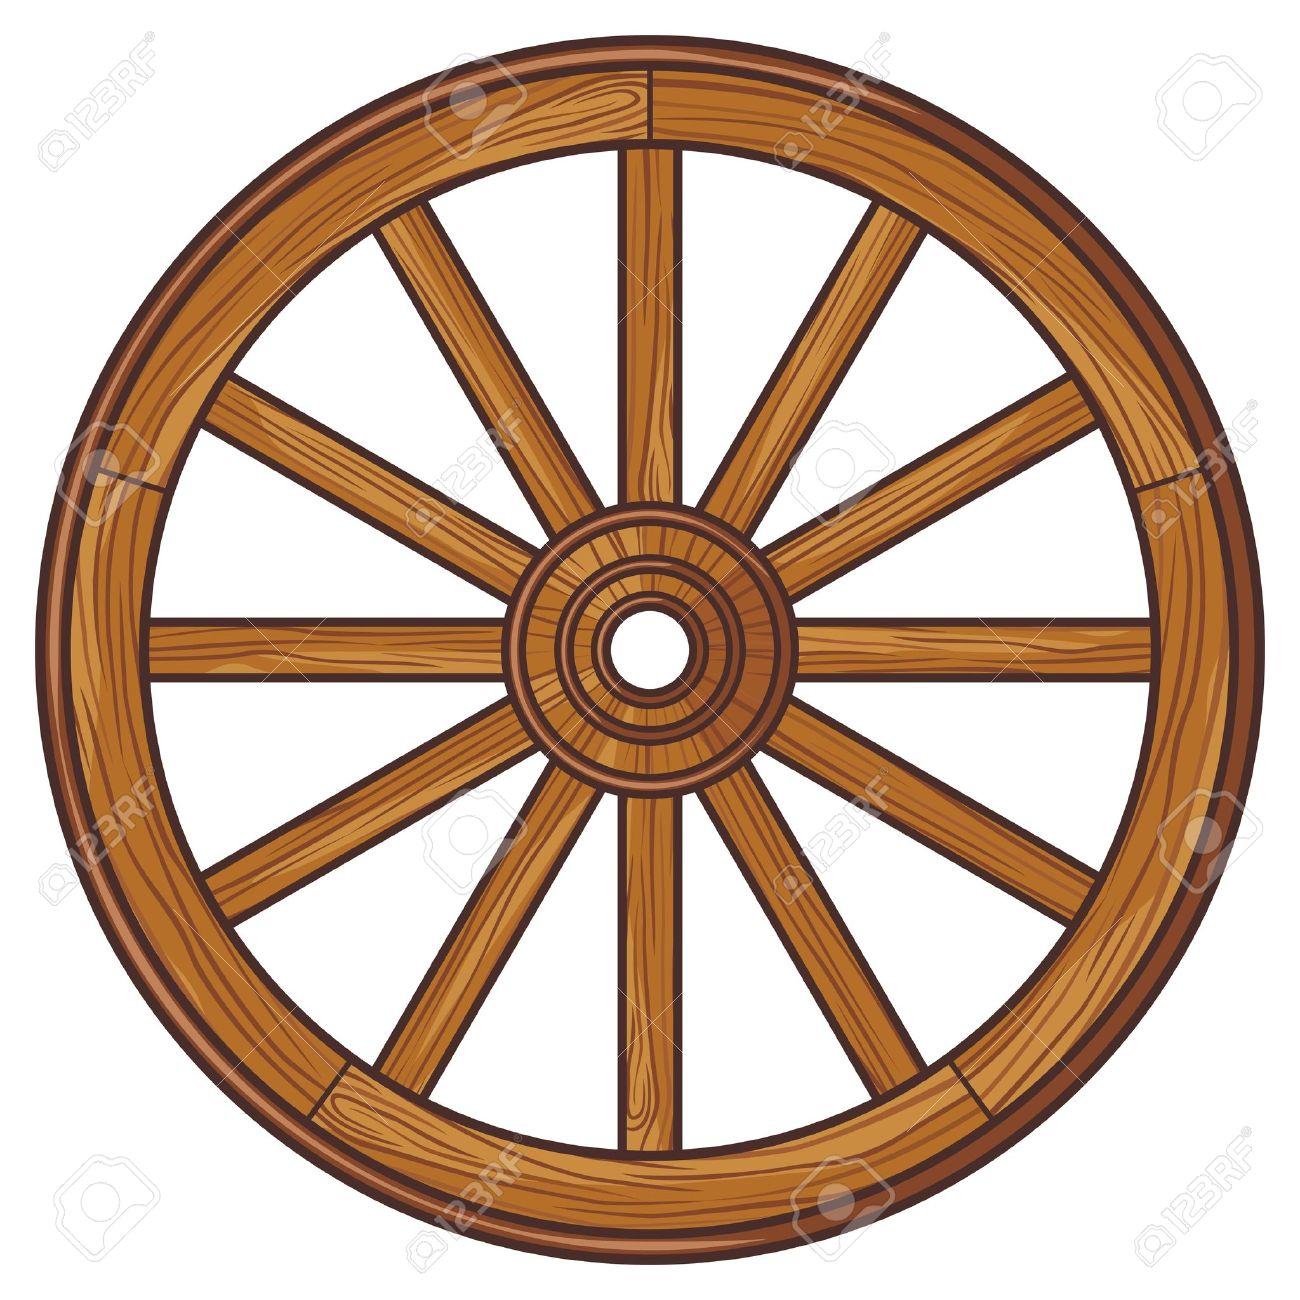 old wooden wheel - 20010582